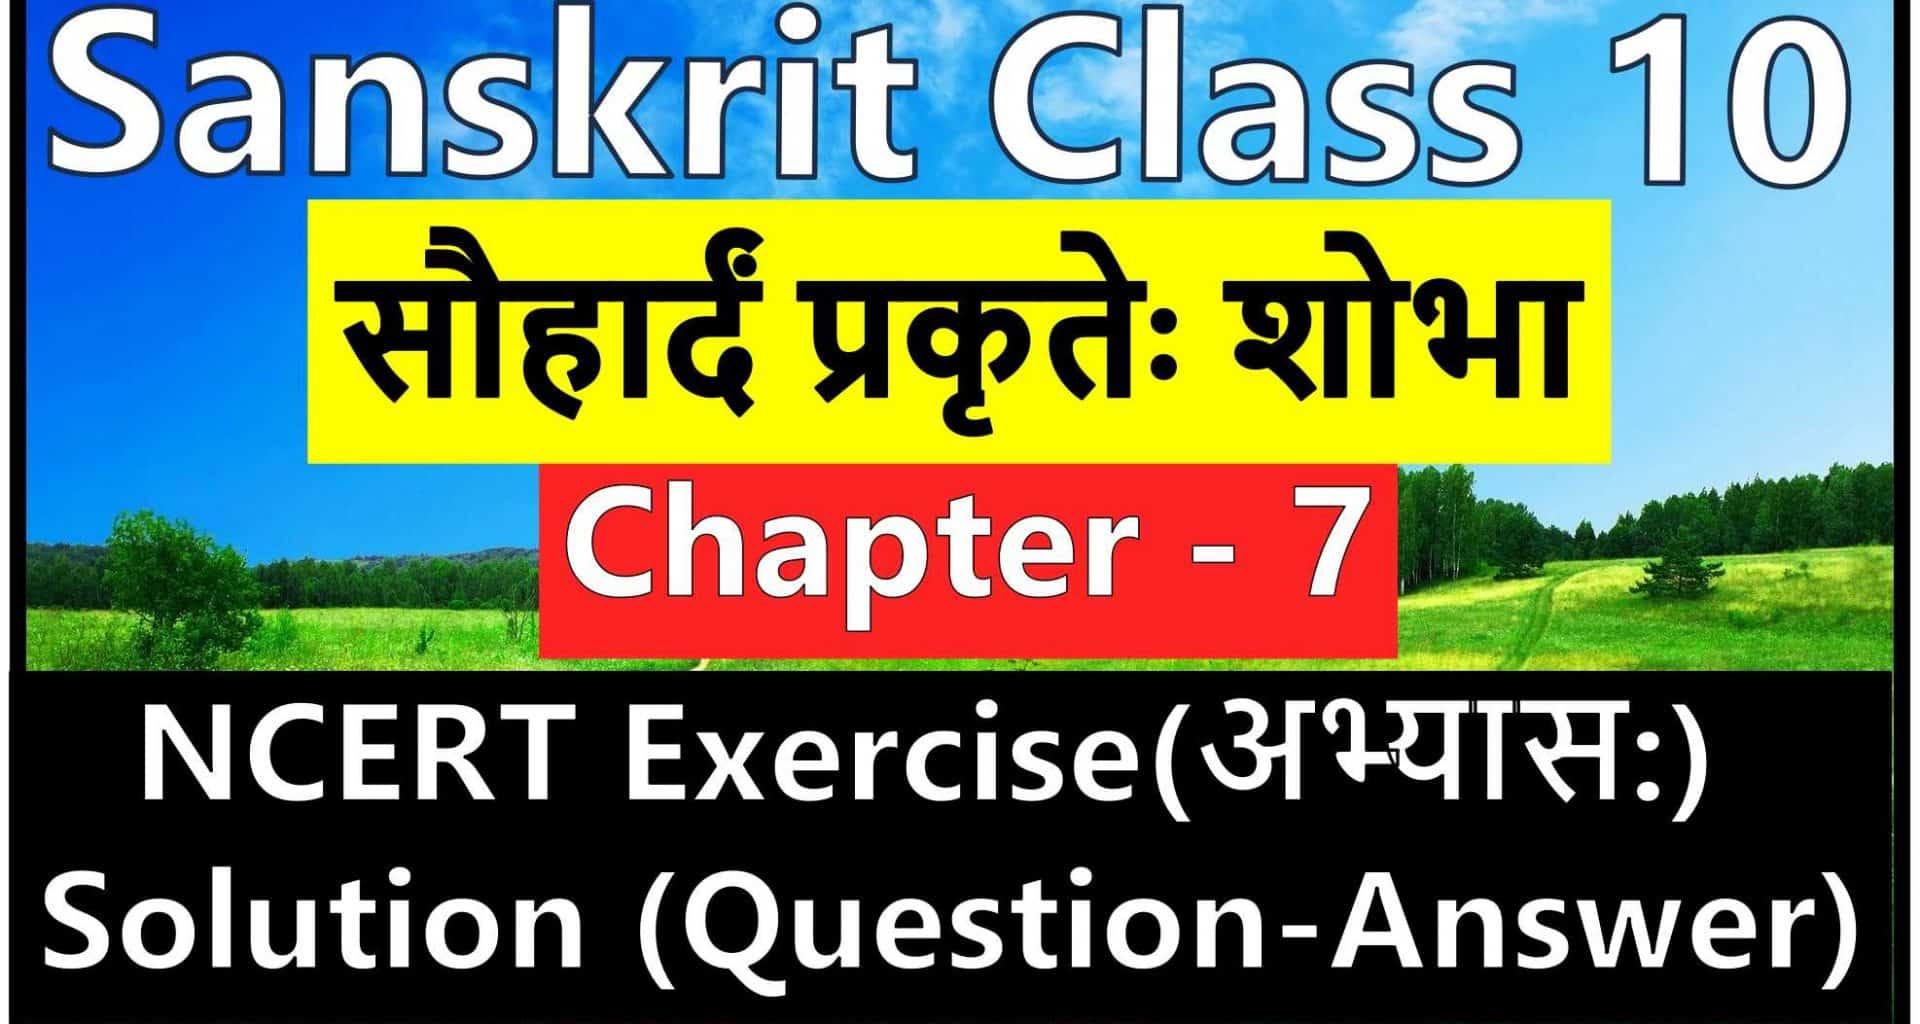 Sanskrit Class 10 - Chapter 7 - सौहार्दं प्रकृतेः शोभा - NCERT Exercise Solution (Question-Answer)